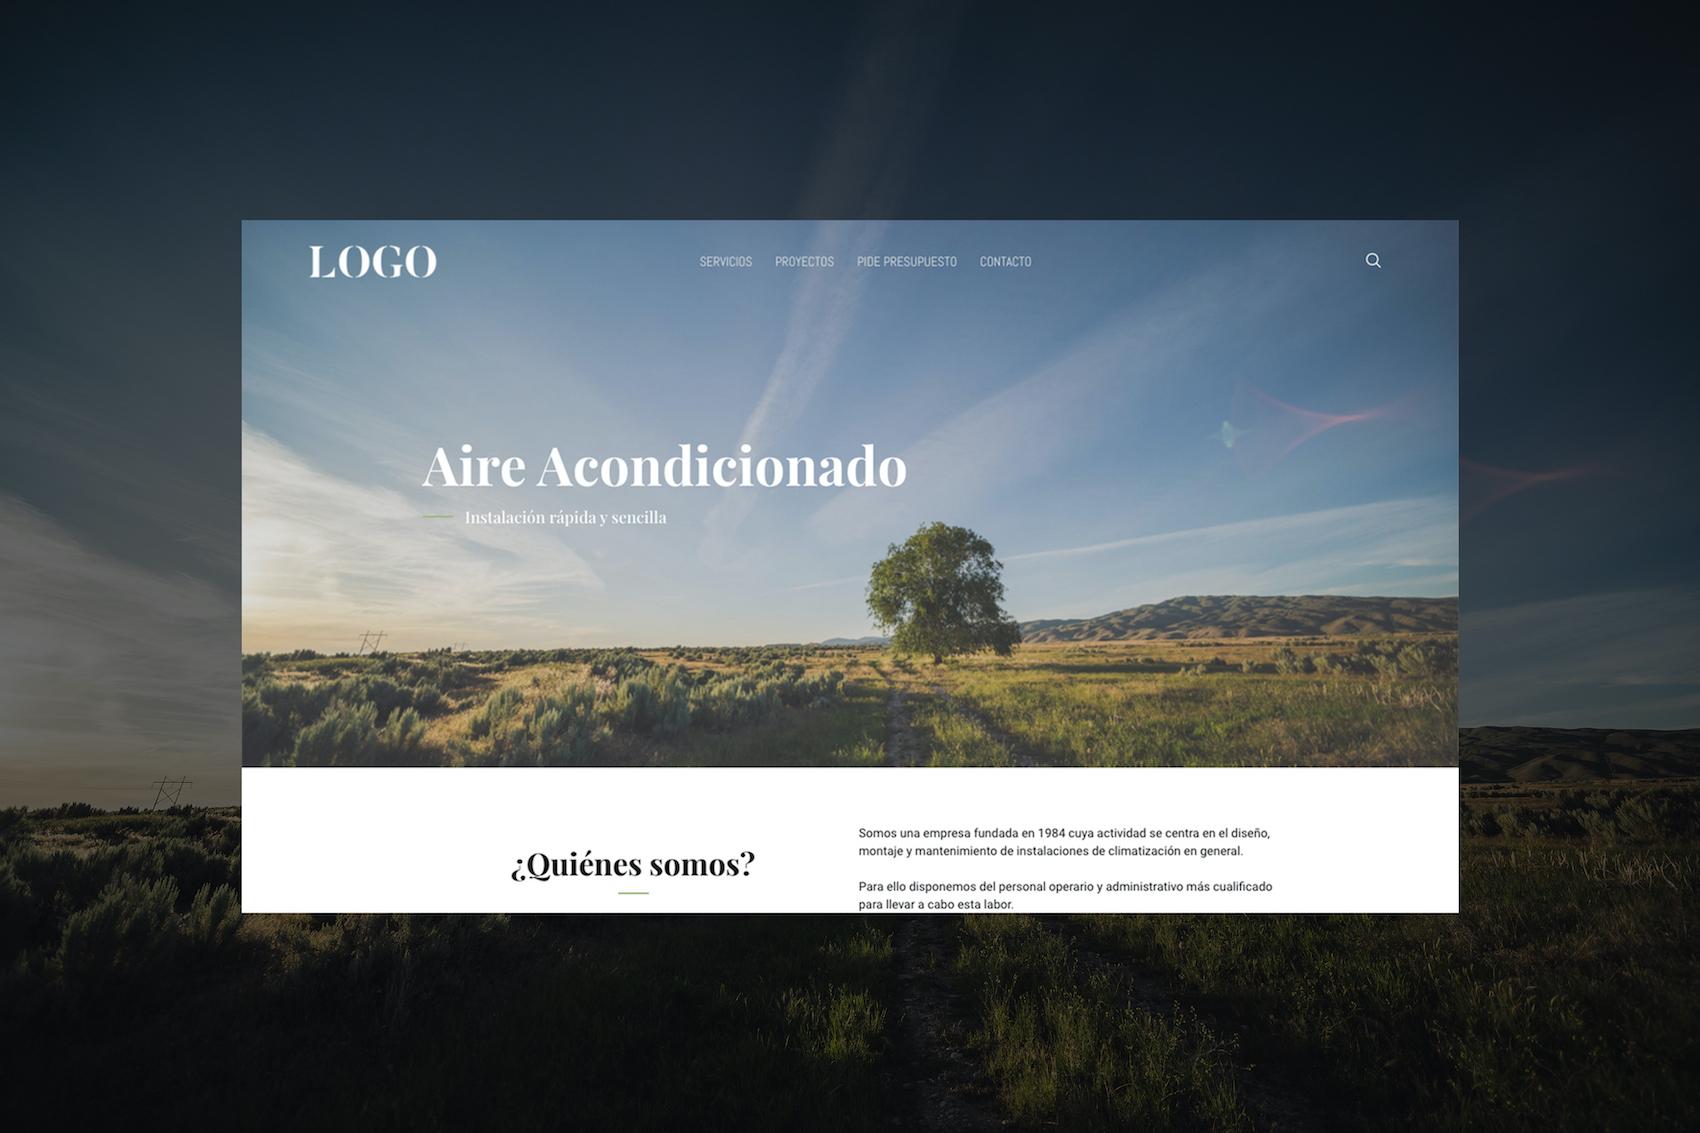 Portfolio persoal de deseño web: ordenador